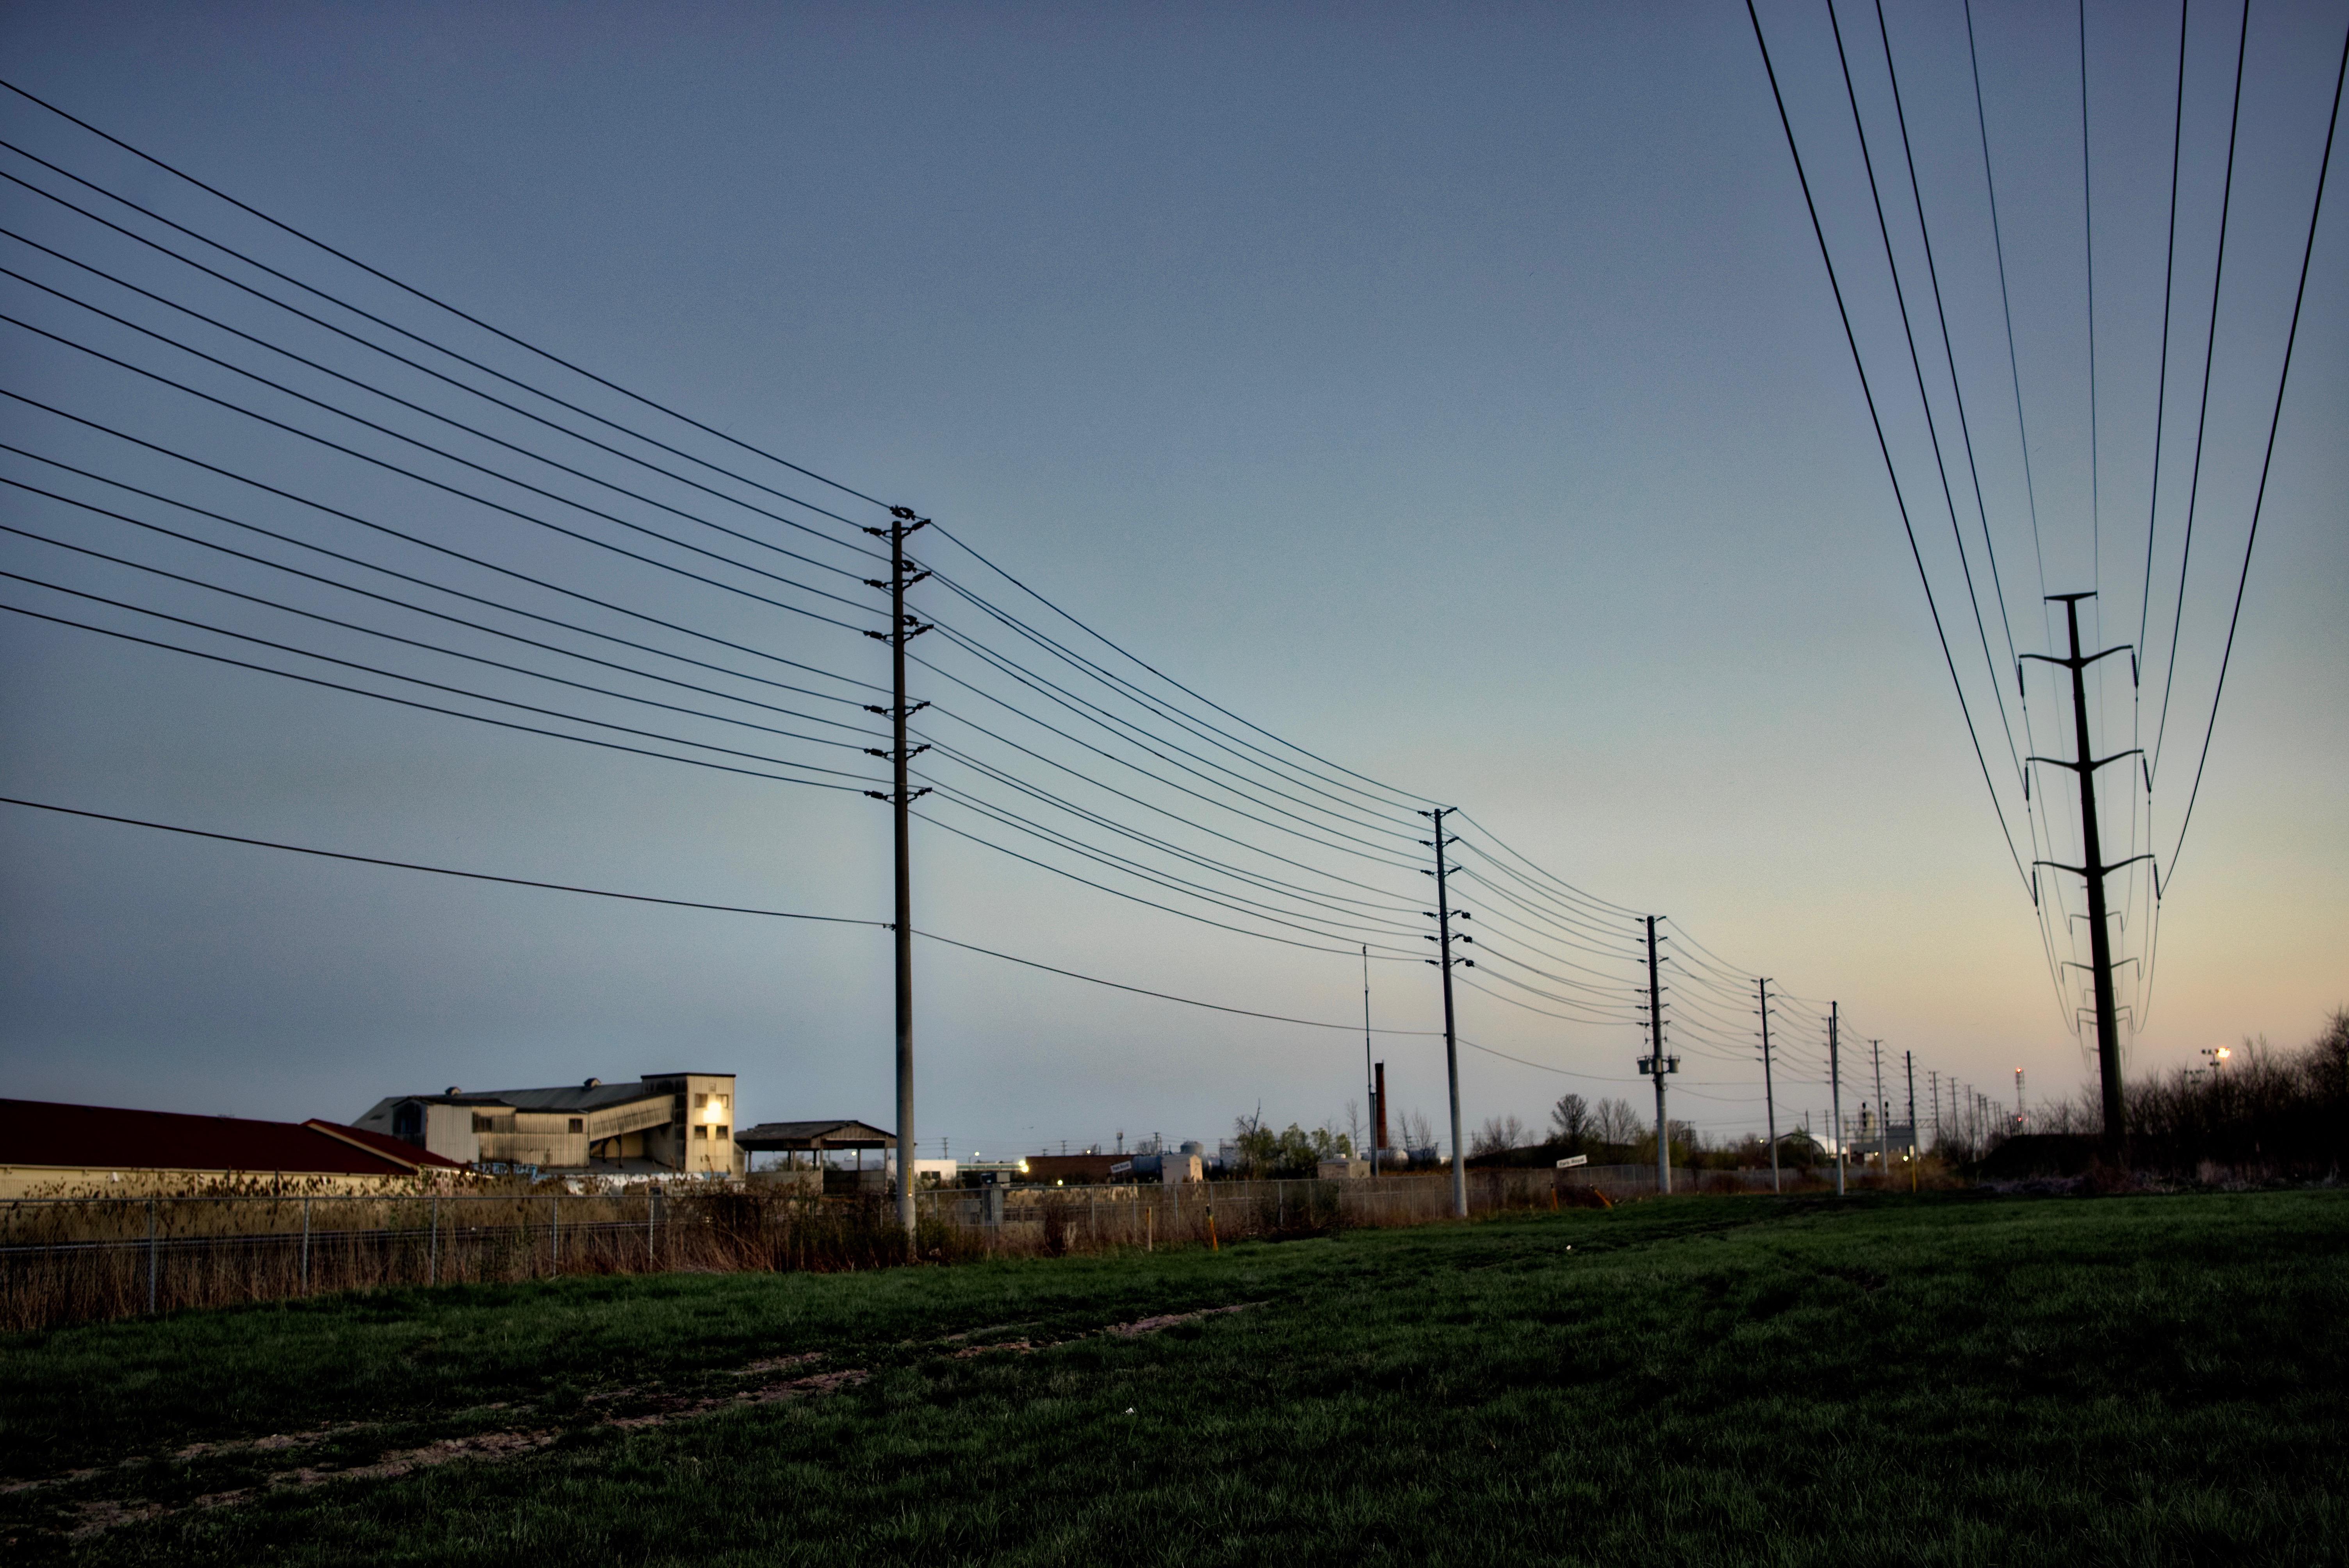 Port Credit, Ontario